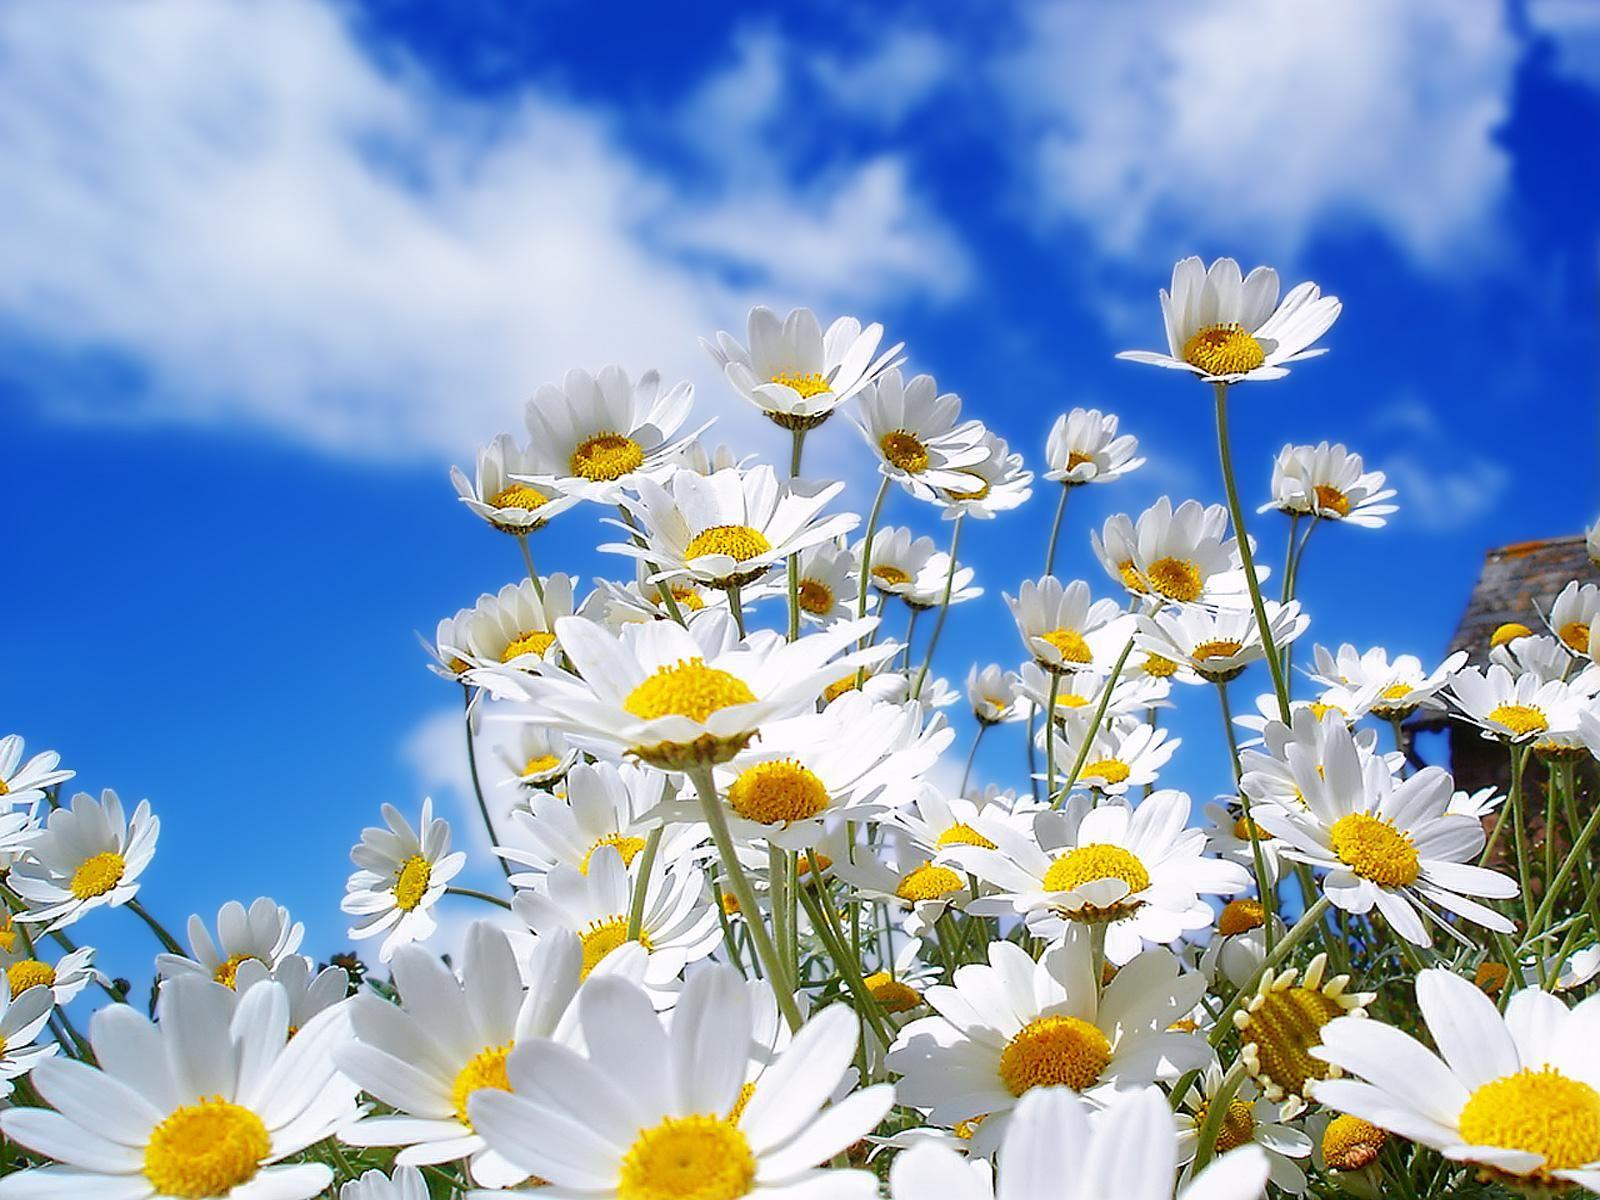 Fondos De Flores Para Fotos Para Pantalla Hd 2 Hd Wallpapers